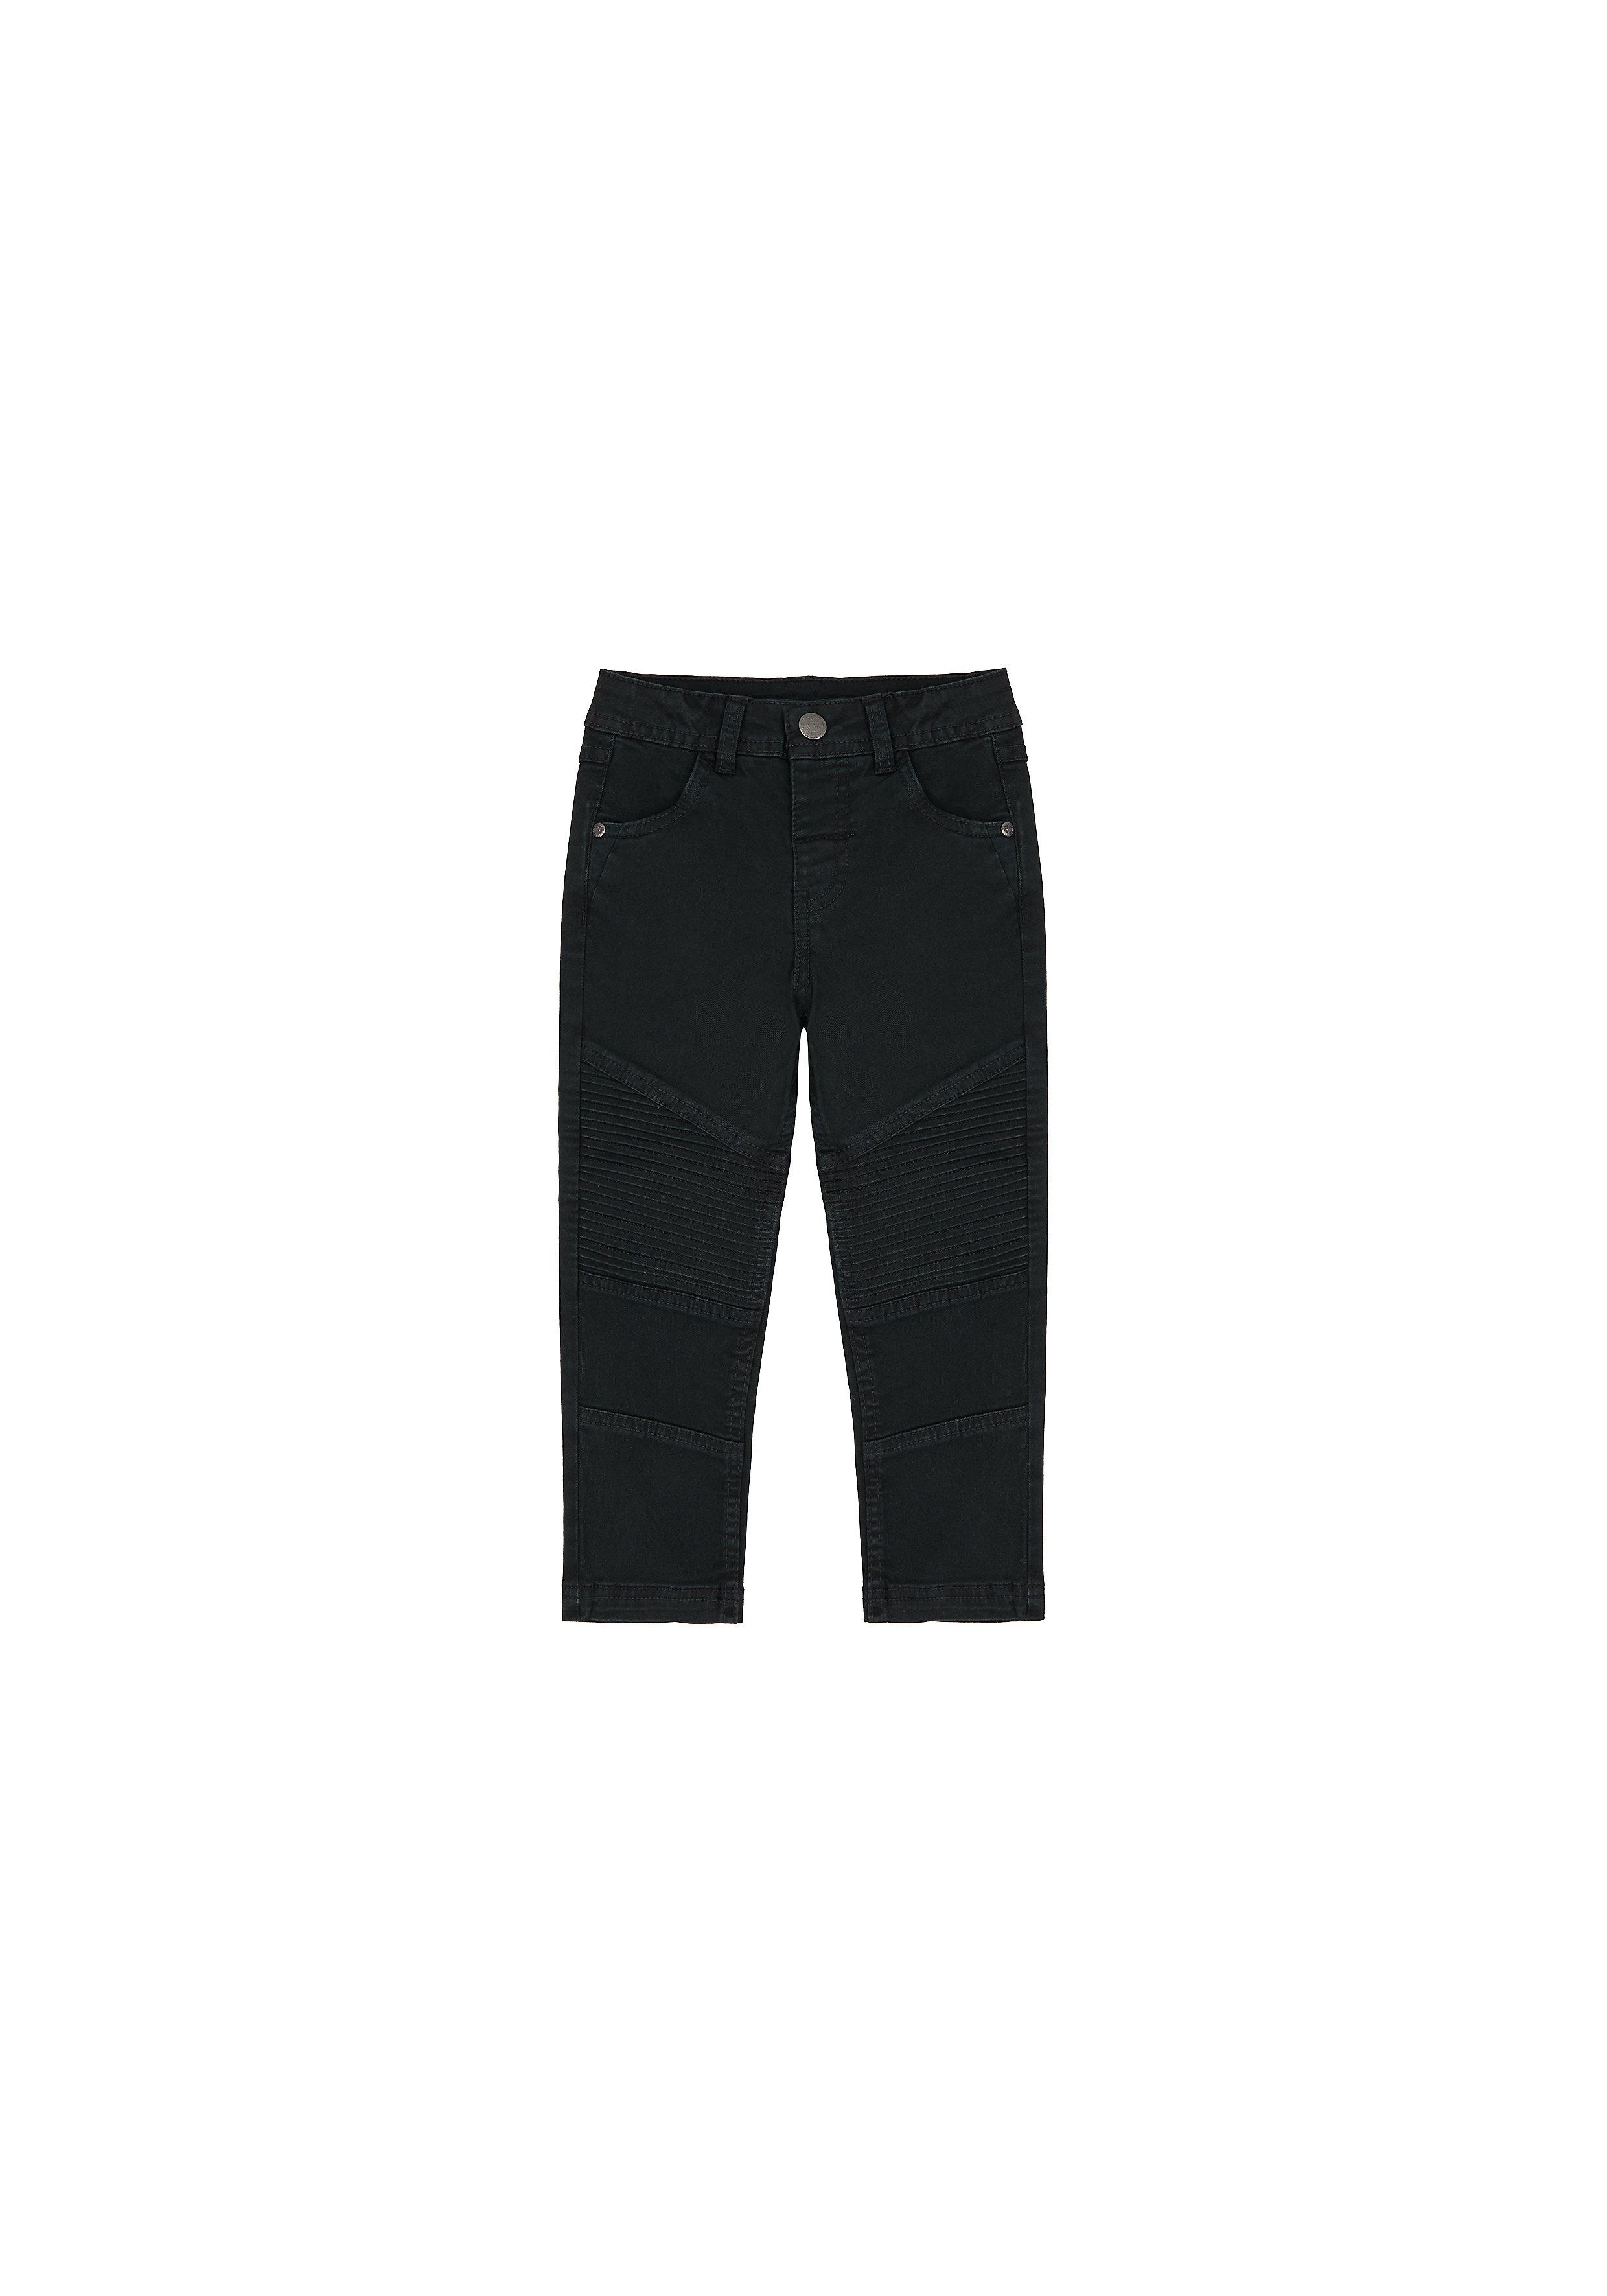 Mothercare | Boys Trousers Panel Details - Black